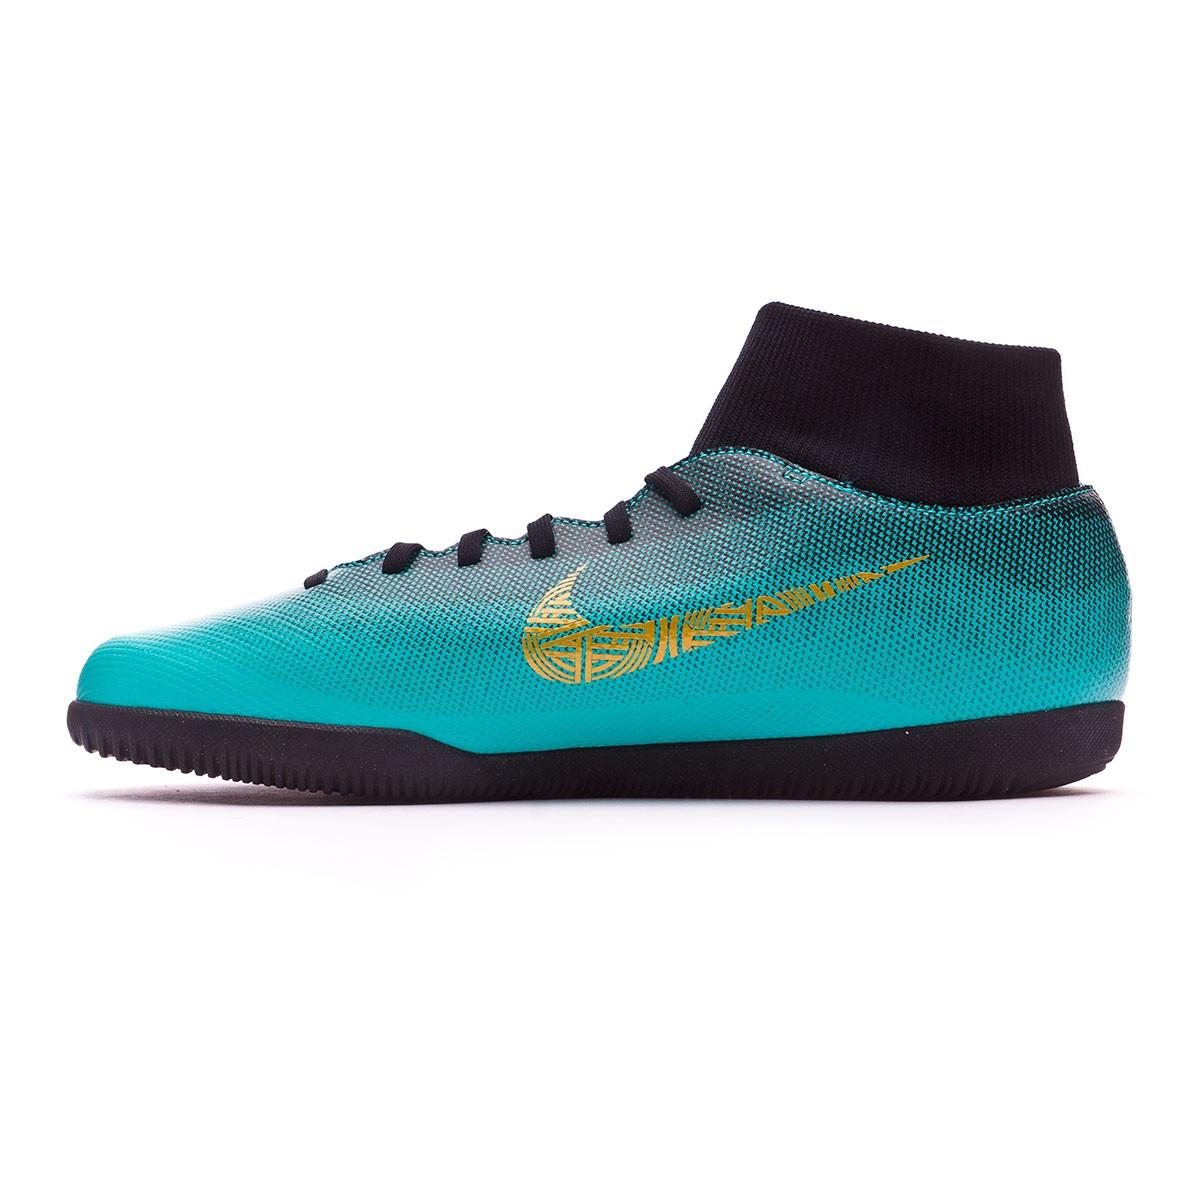 cf1f769cf01c Zapatilla Nike Mercurial SuperflyX VI Club CR7 IC Clear jade-Metallic vivid  gold-Black - Tienda de fútbol Fútbol Emotion